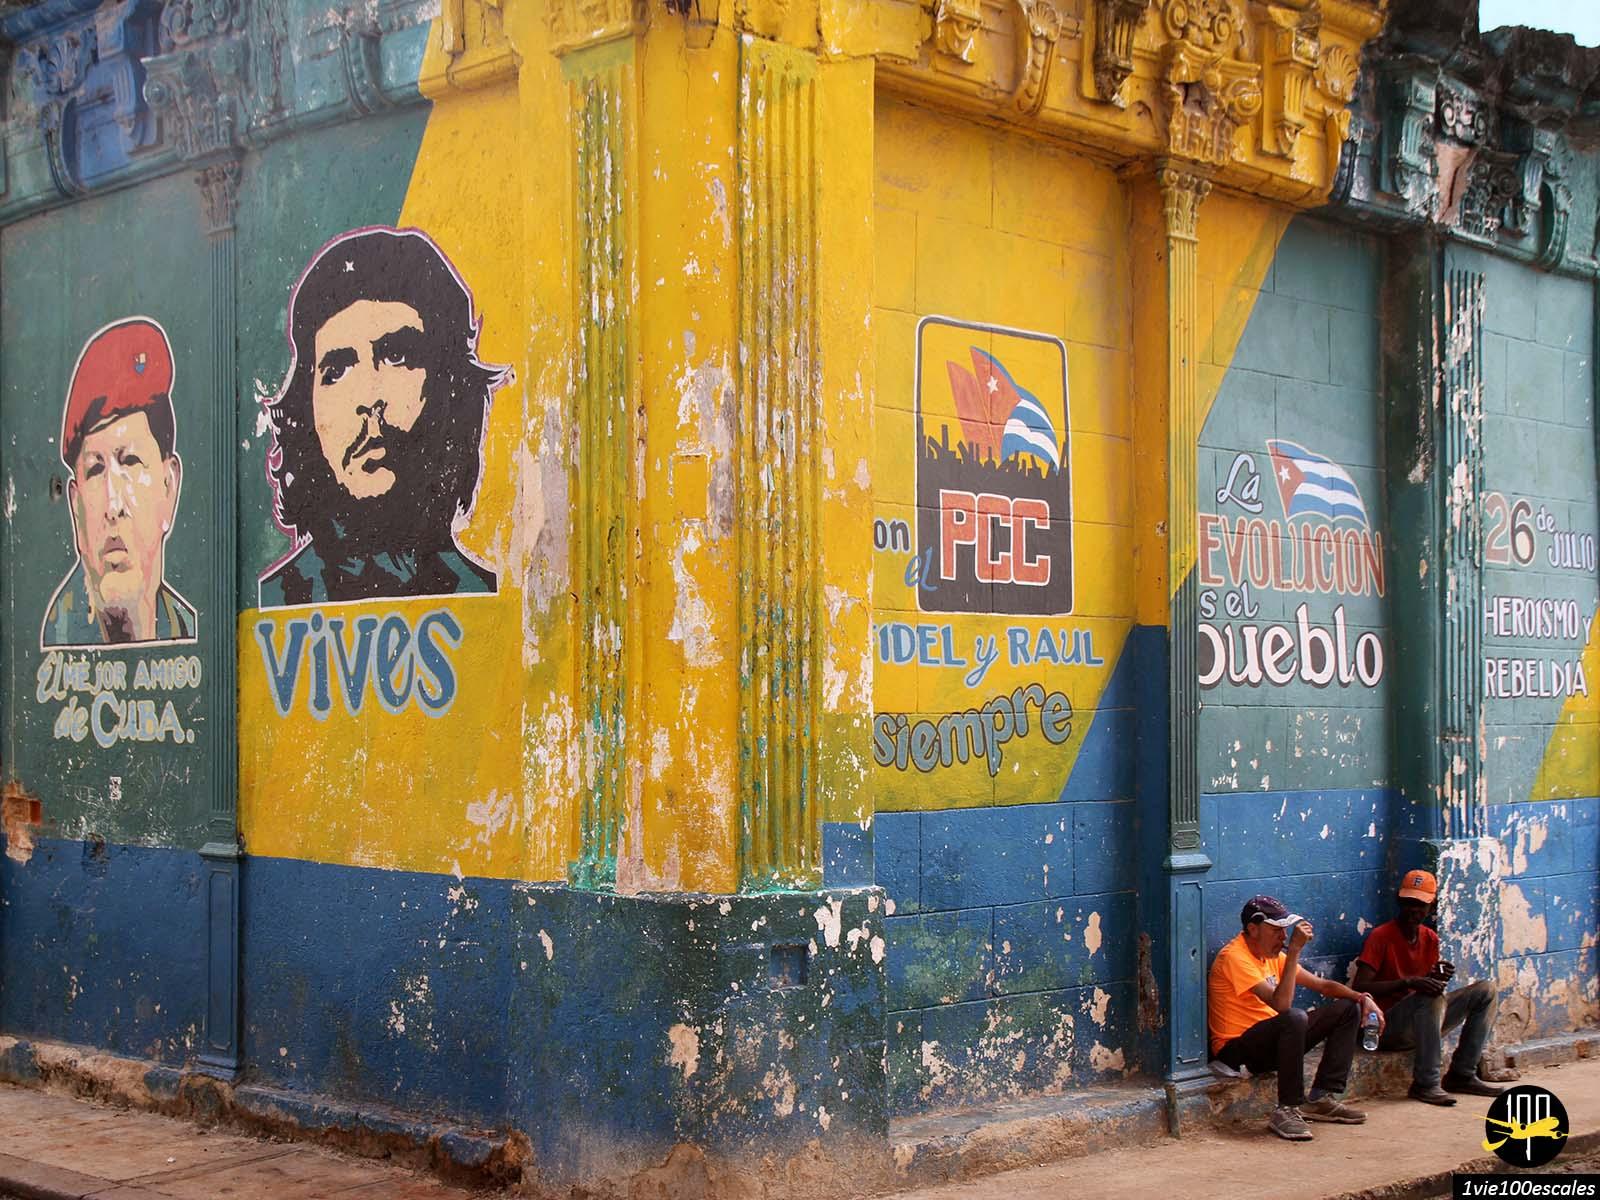 Un dessin du Che Guevara sur un mur de la vieille ville de La Havane